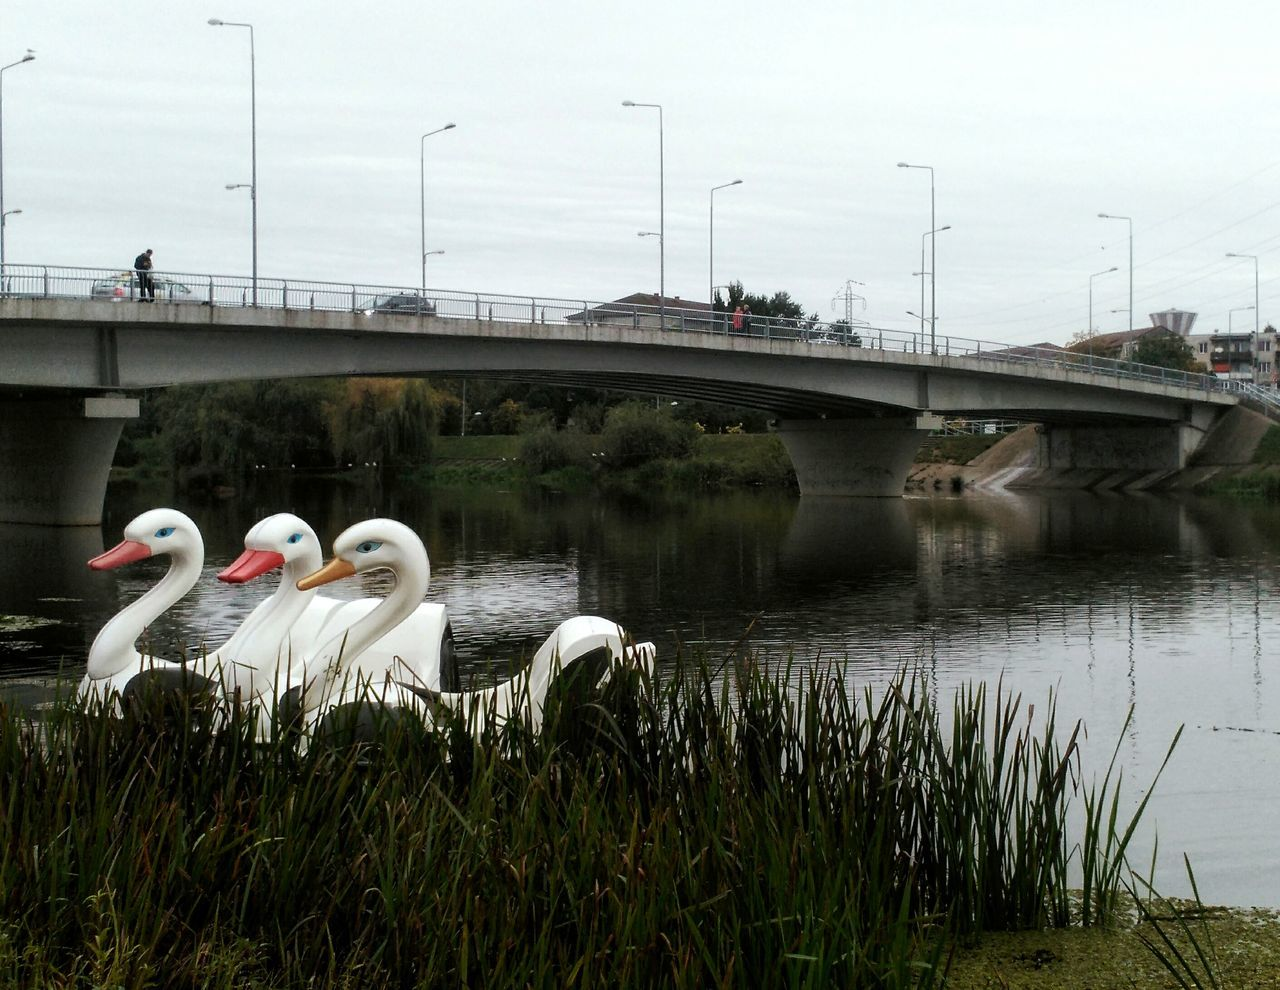 Connection Water Architecture Animals In The Wild Transportation Bridge River Swan Plant Outdoors Nature Beautyinnature  Oradea Romania